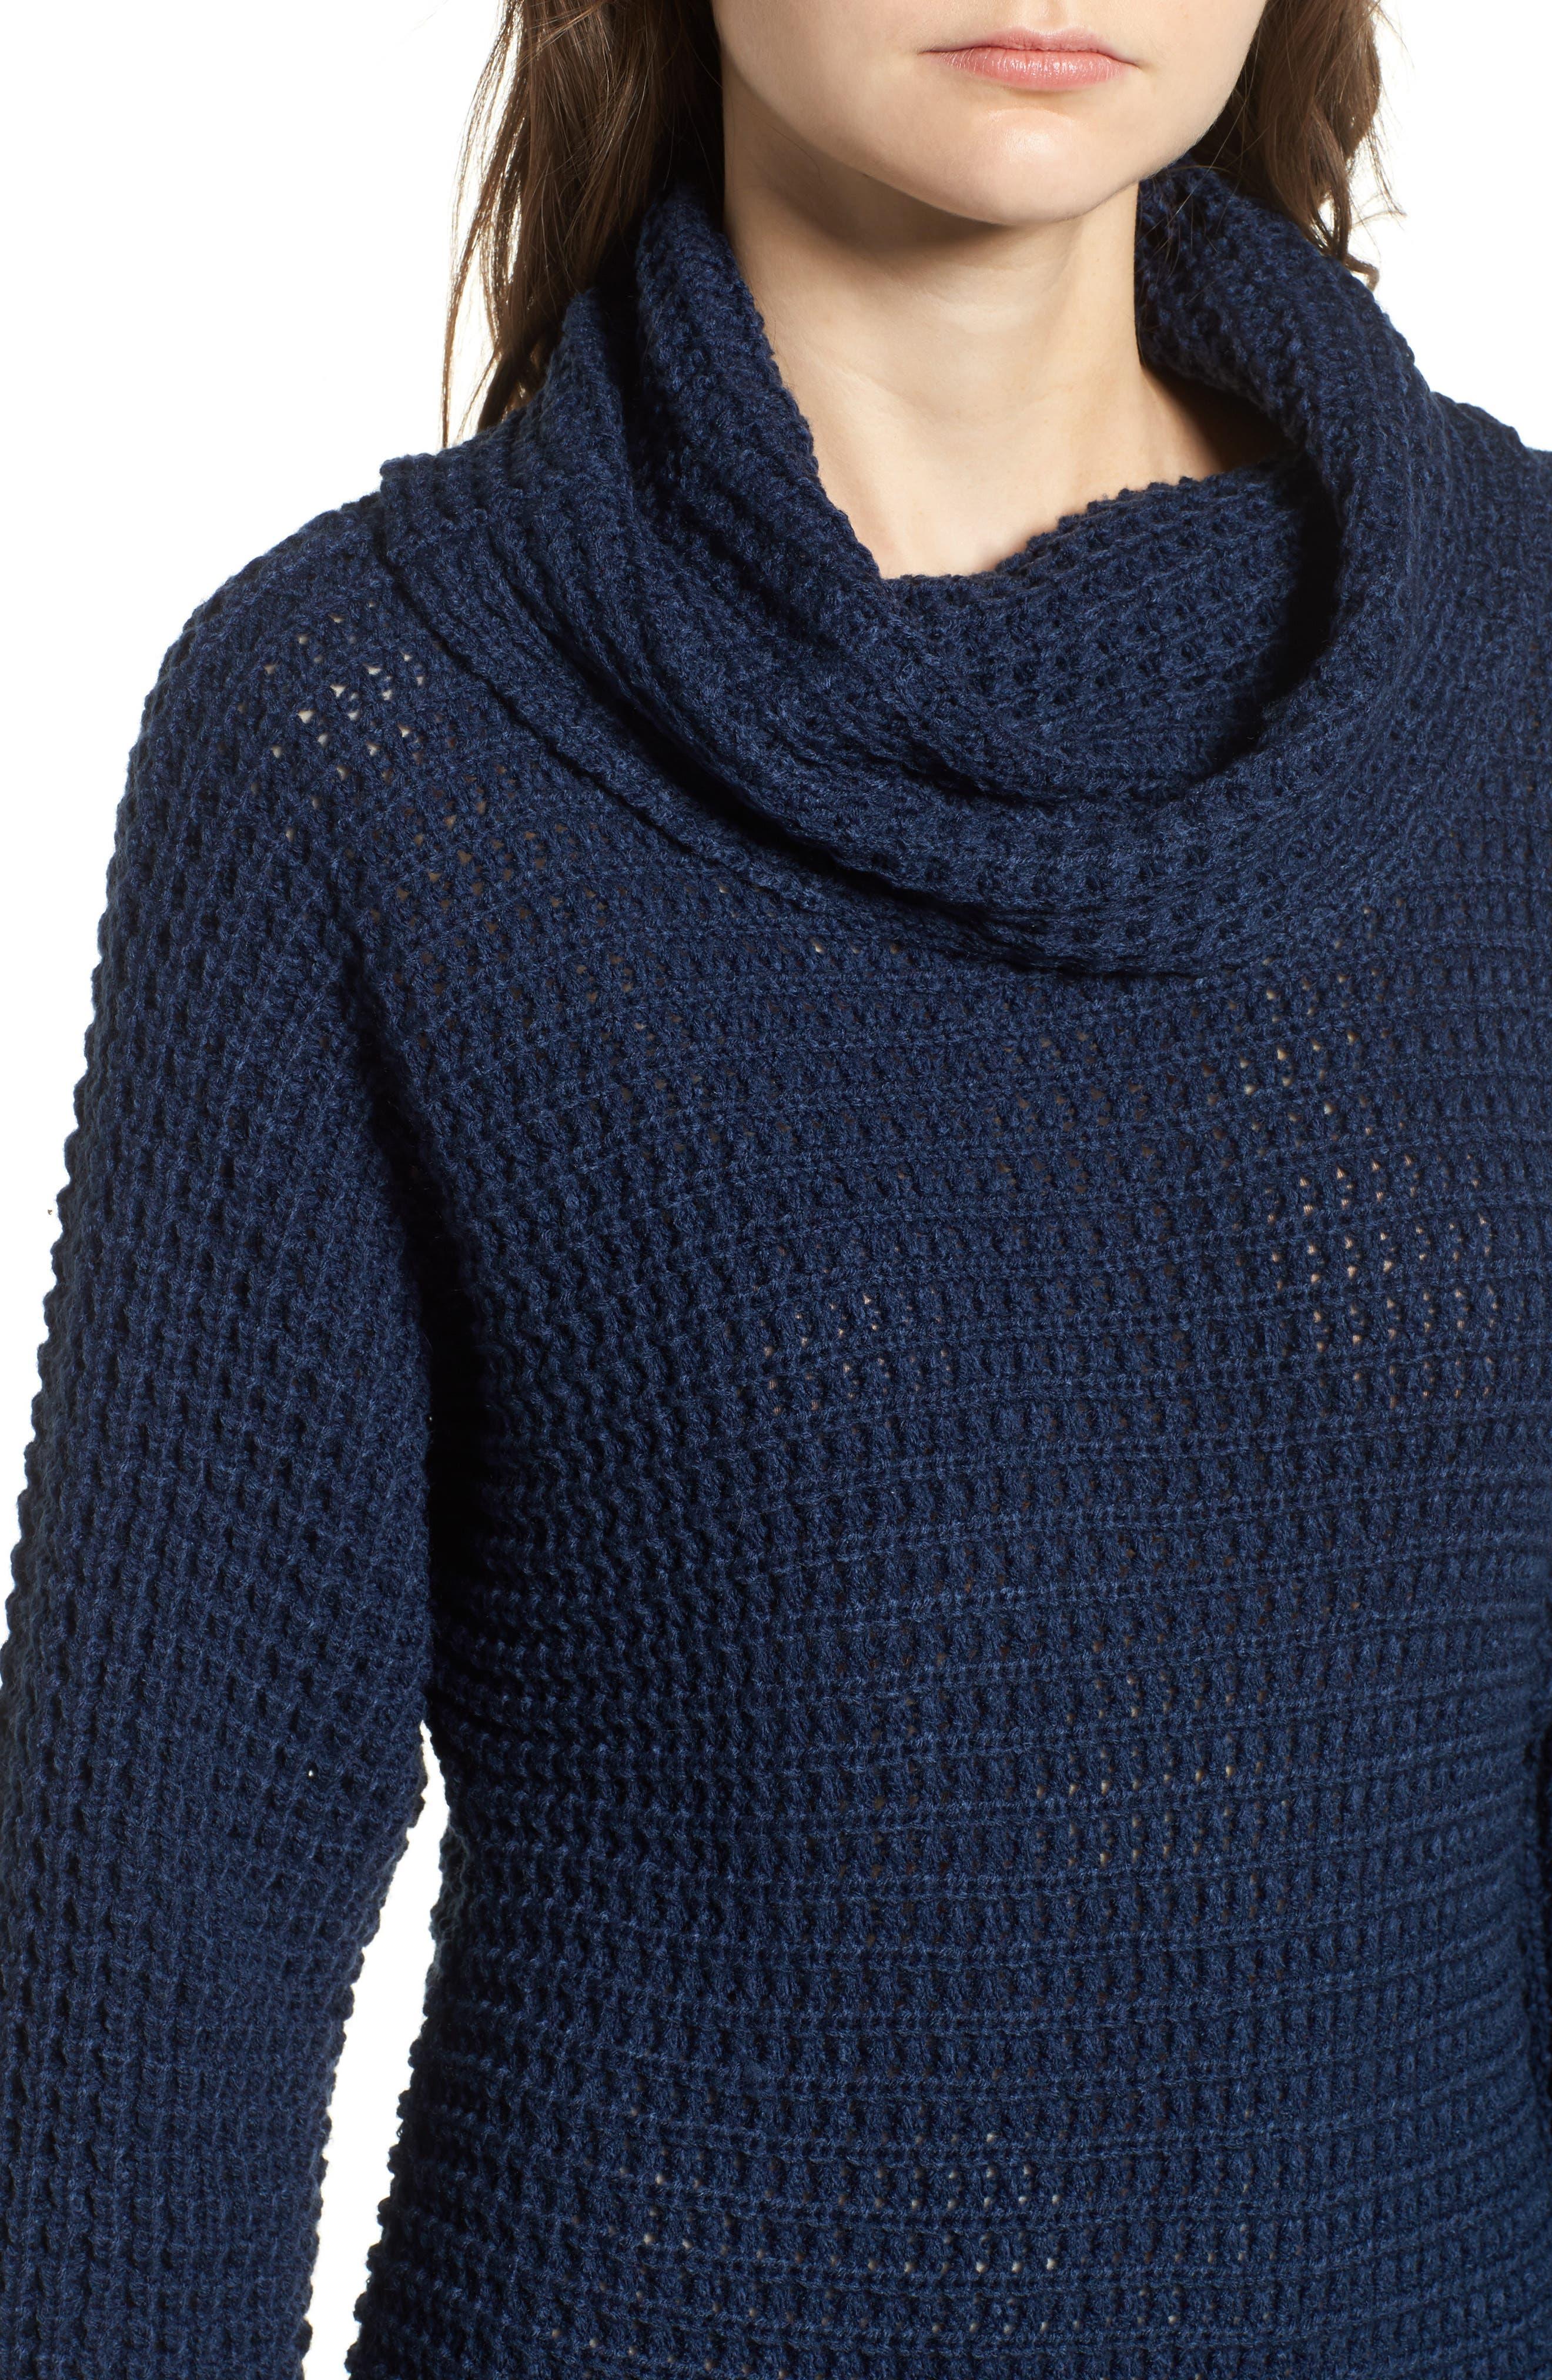 Turtleneck Sweater Dress,                             Alternate thumbnail 4, color,                             410